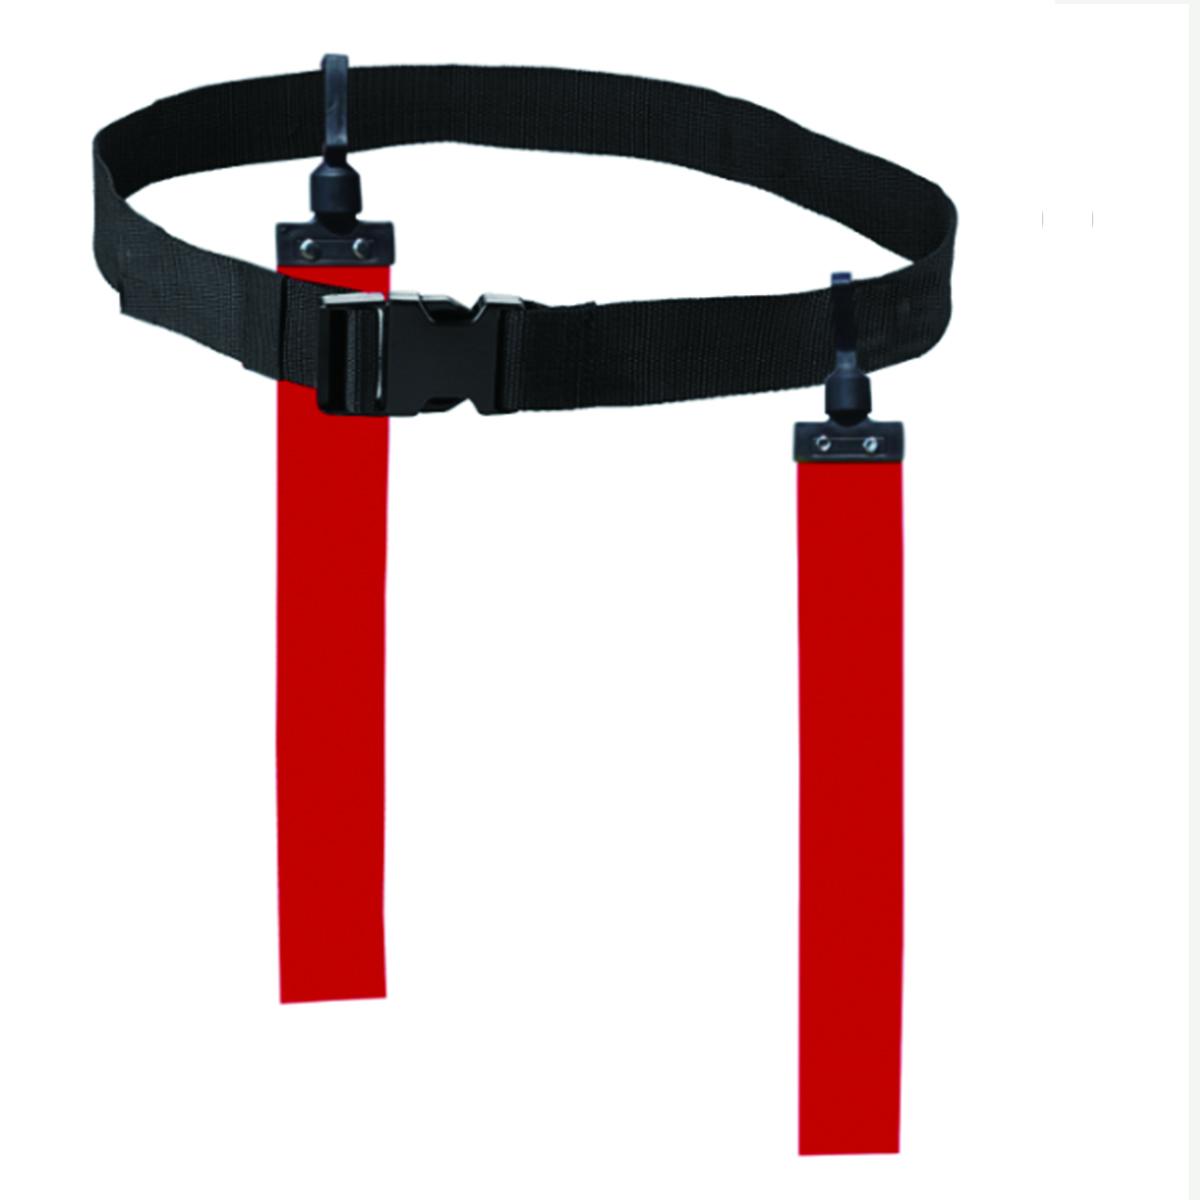 Football Match Rugby Training Adjustable Waist Belt Ribbon Waist Strap Outdoor Personnel Care Belt